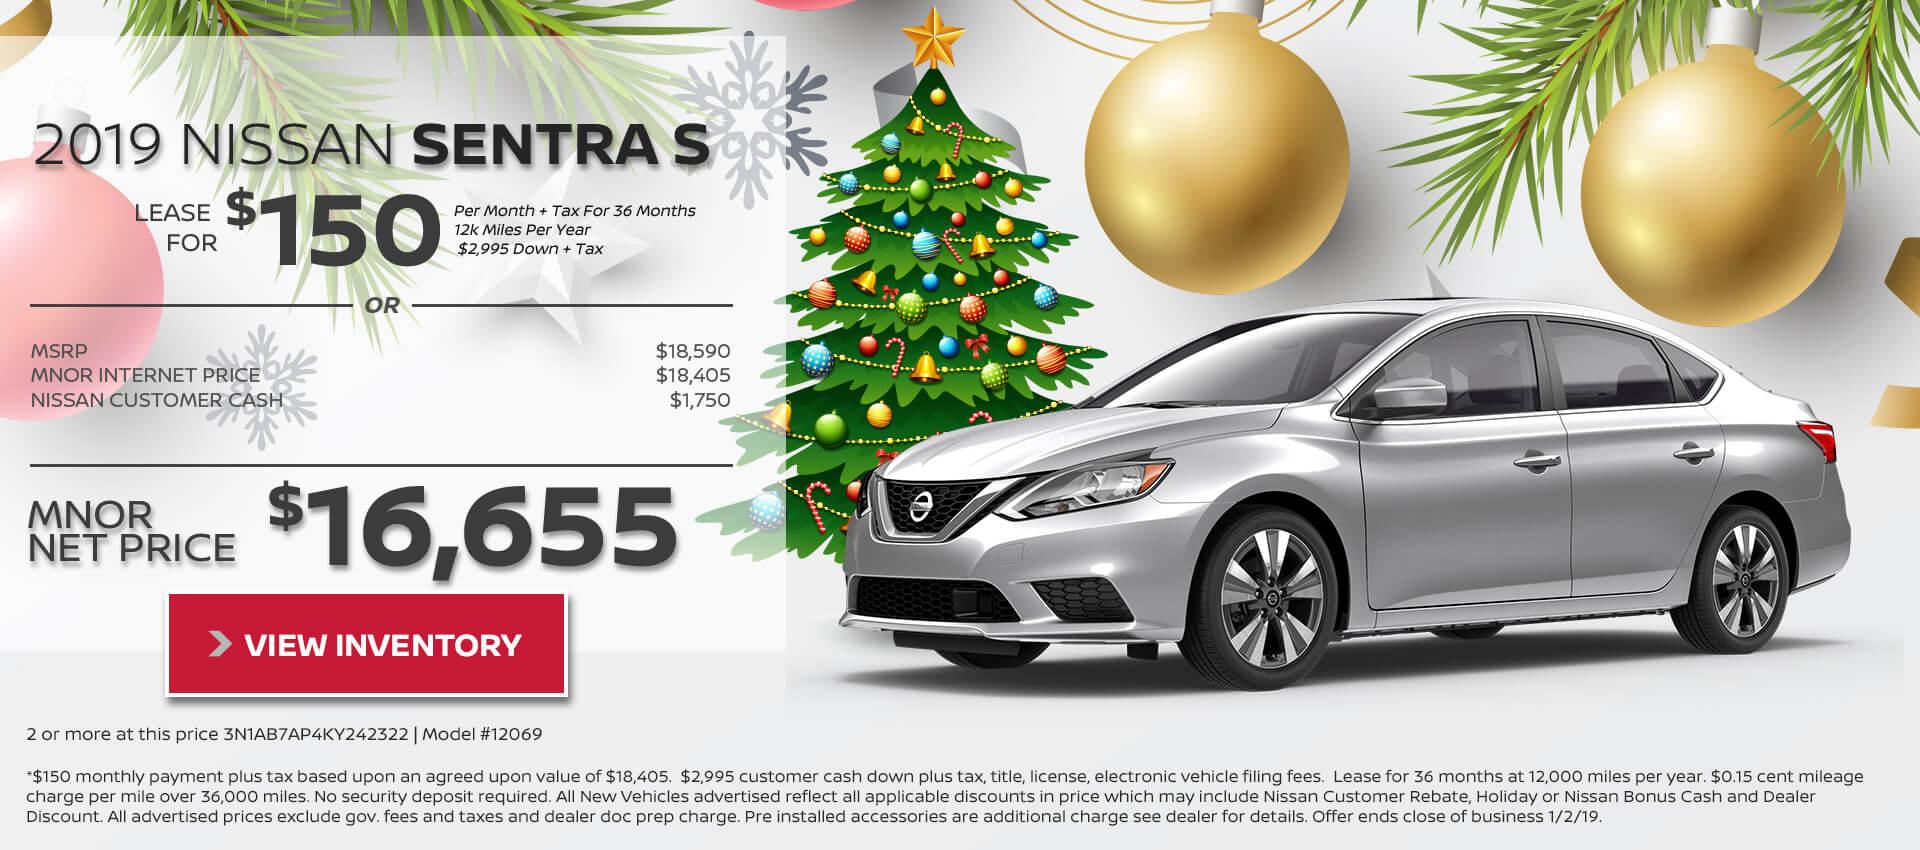 2019 Nissan Sentra $16,655